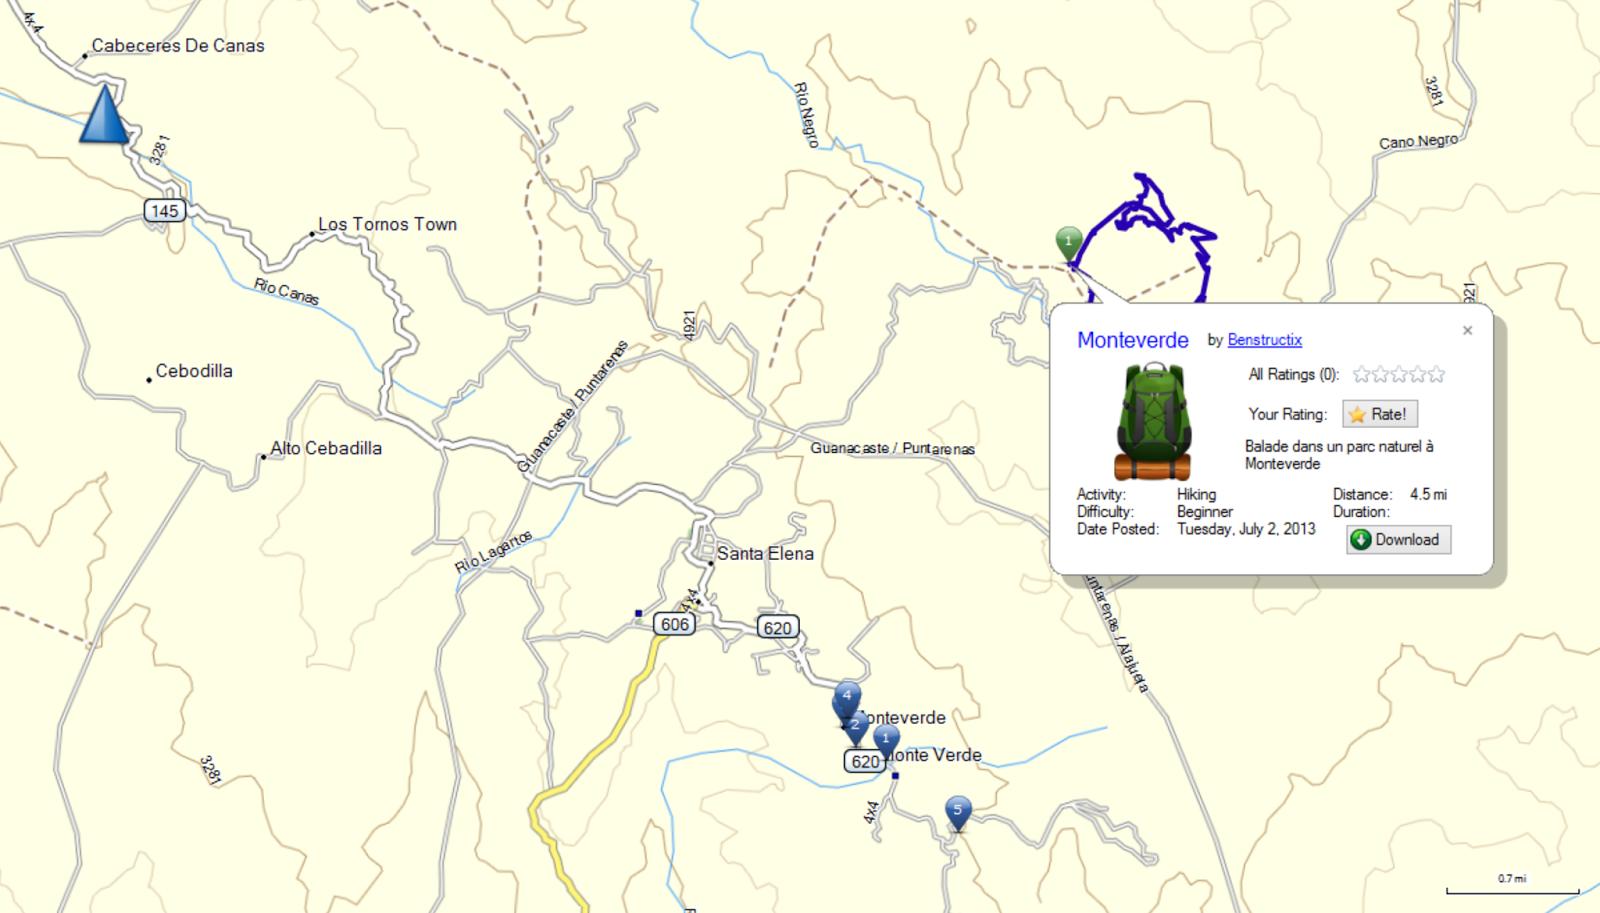 gps with costa rica maps Gps Garmin Map Costa Rica Gps Map Garmin Gps Maps Gps gps with costa rica maps